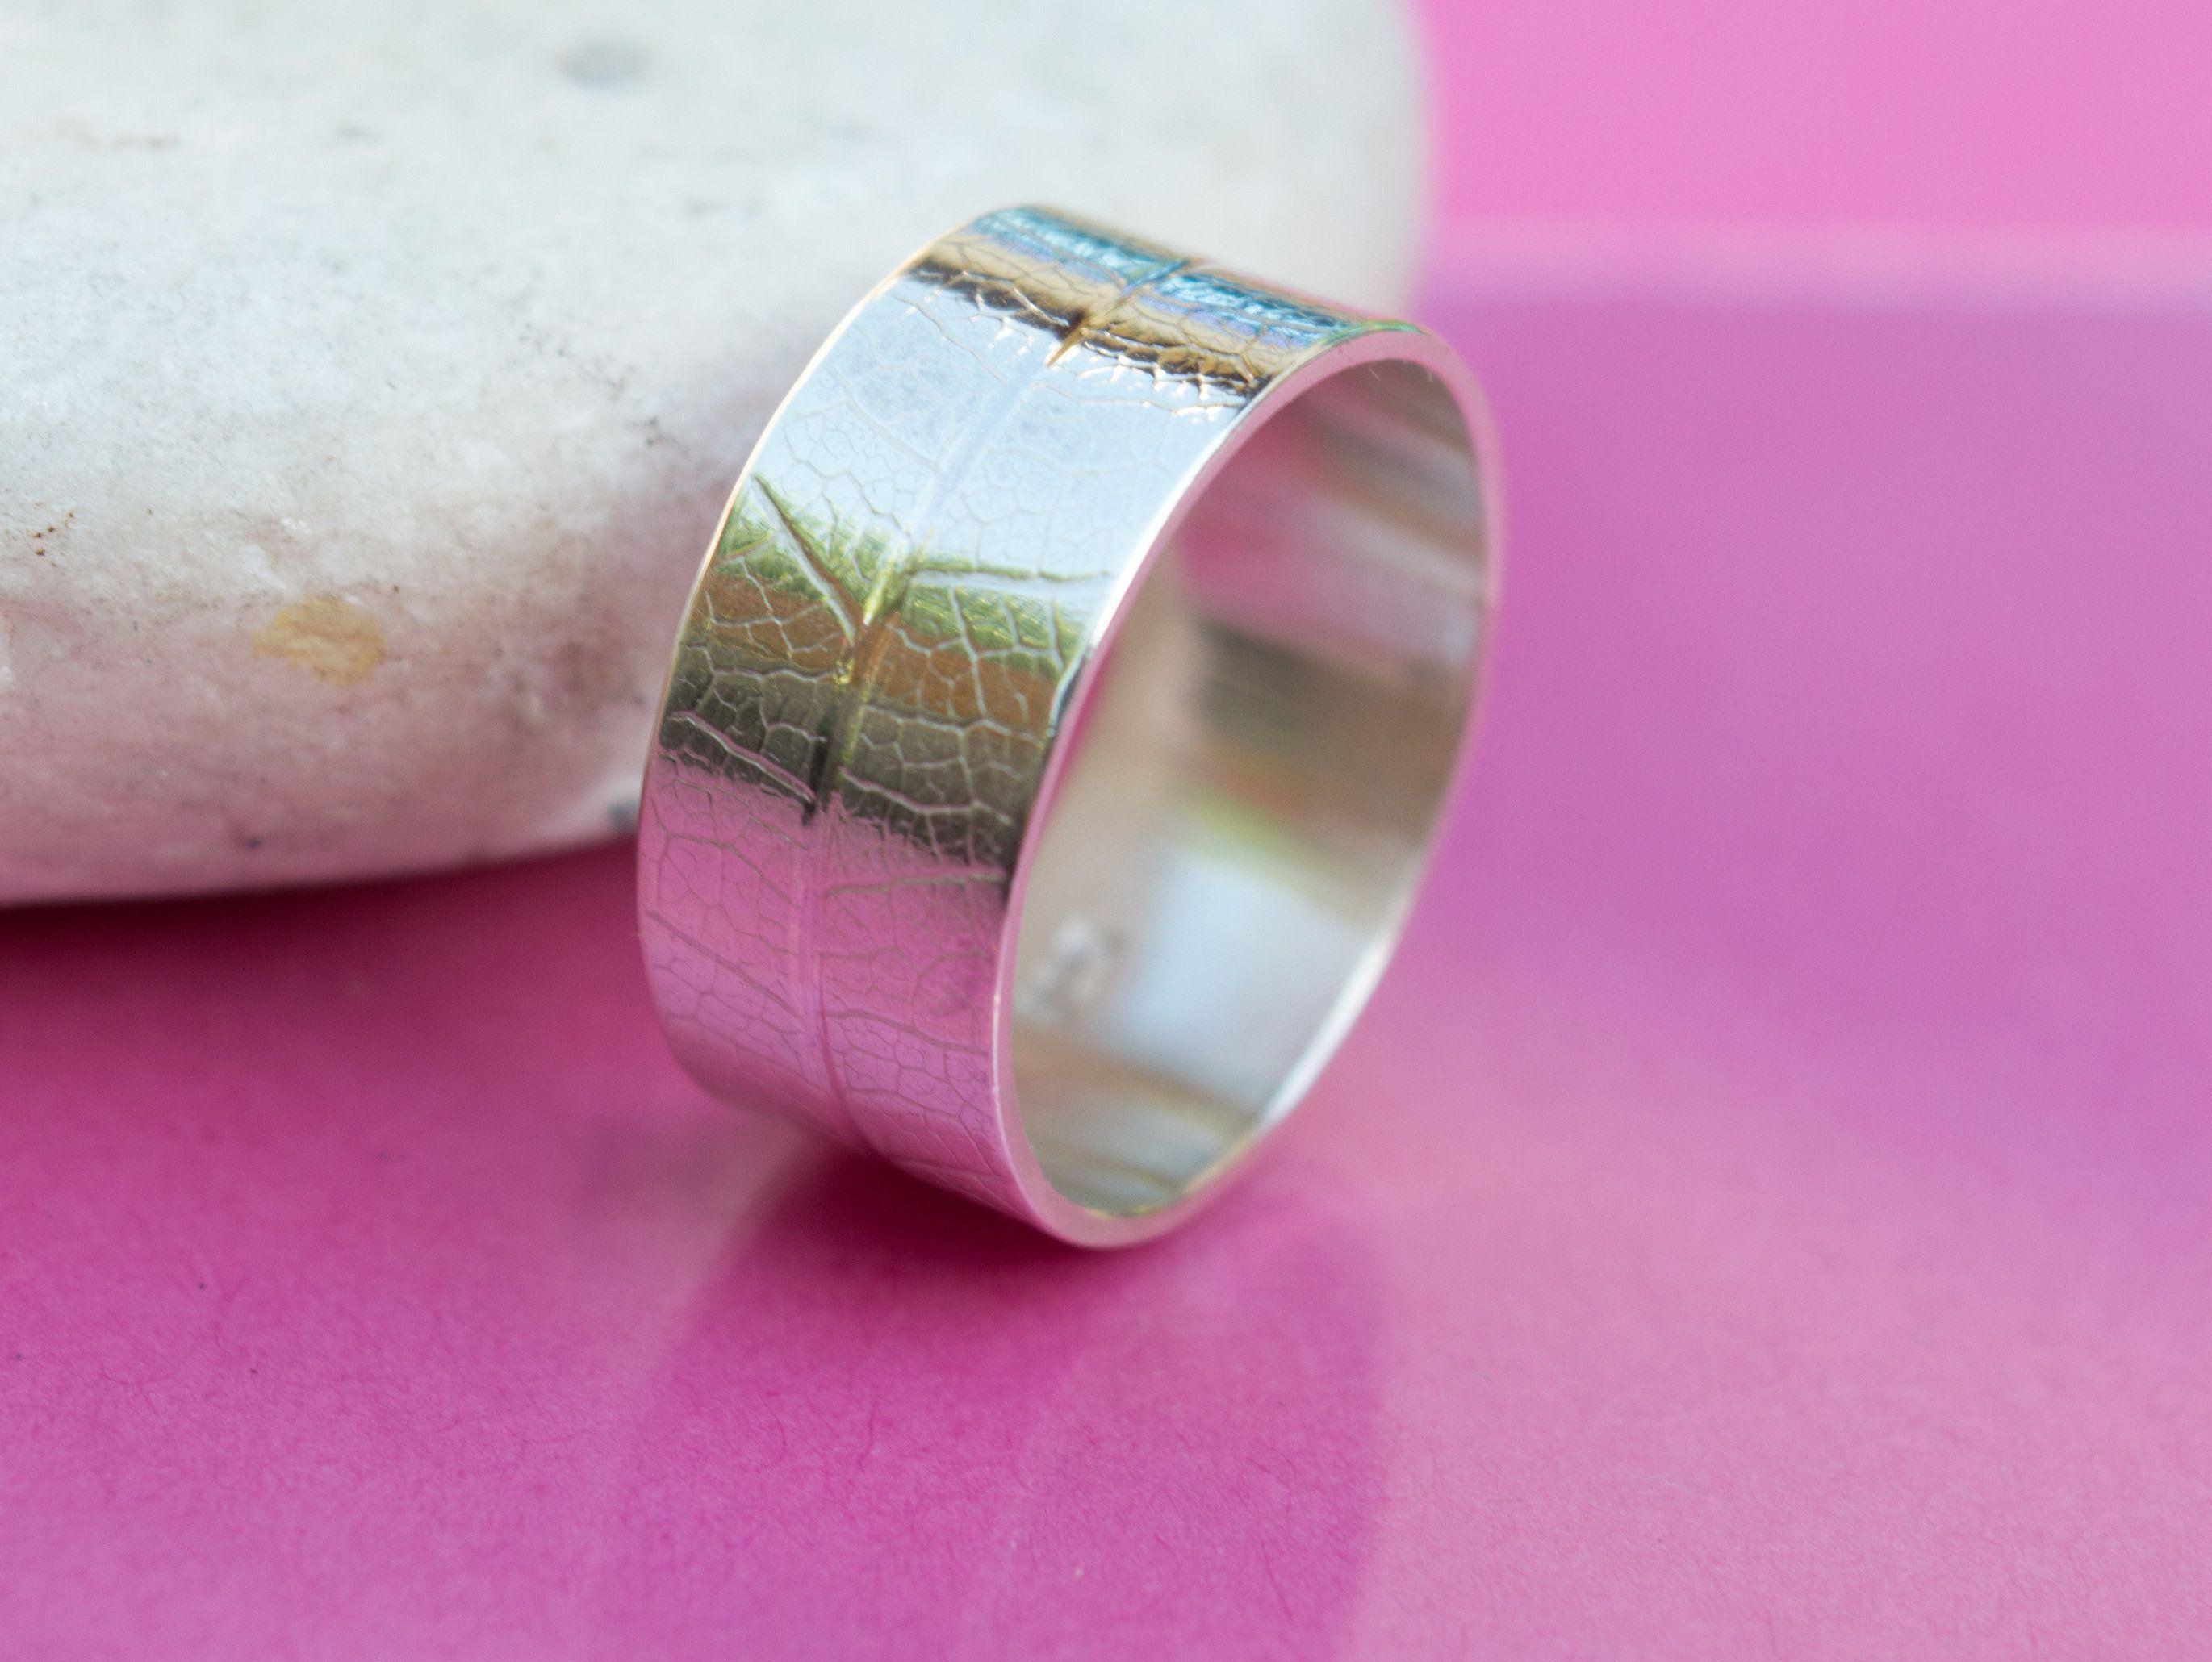 Thumb ring-Band ring-Sterling silver ring-Stacking ring-Silver thumb ...